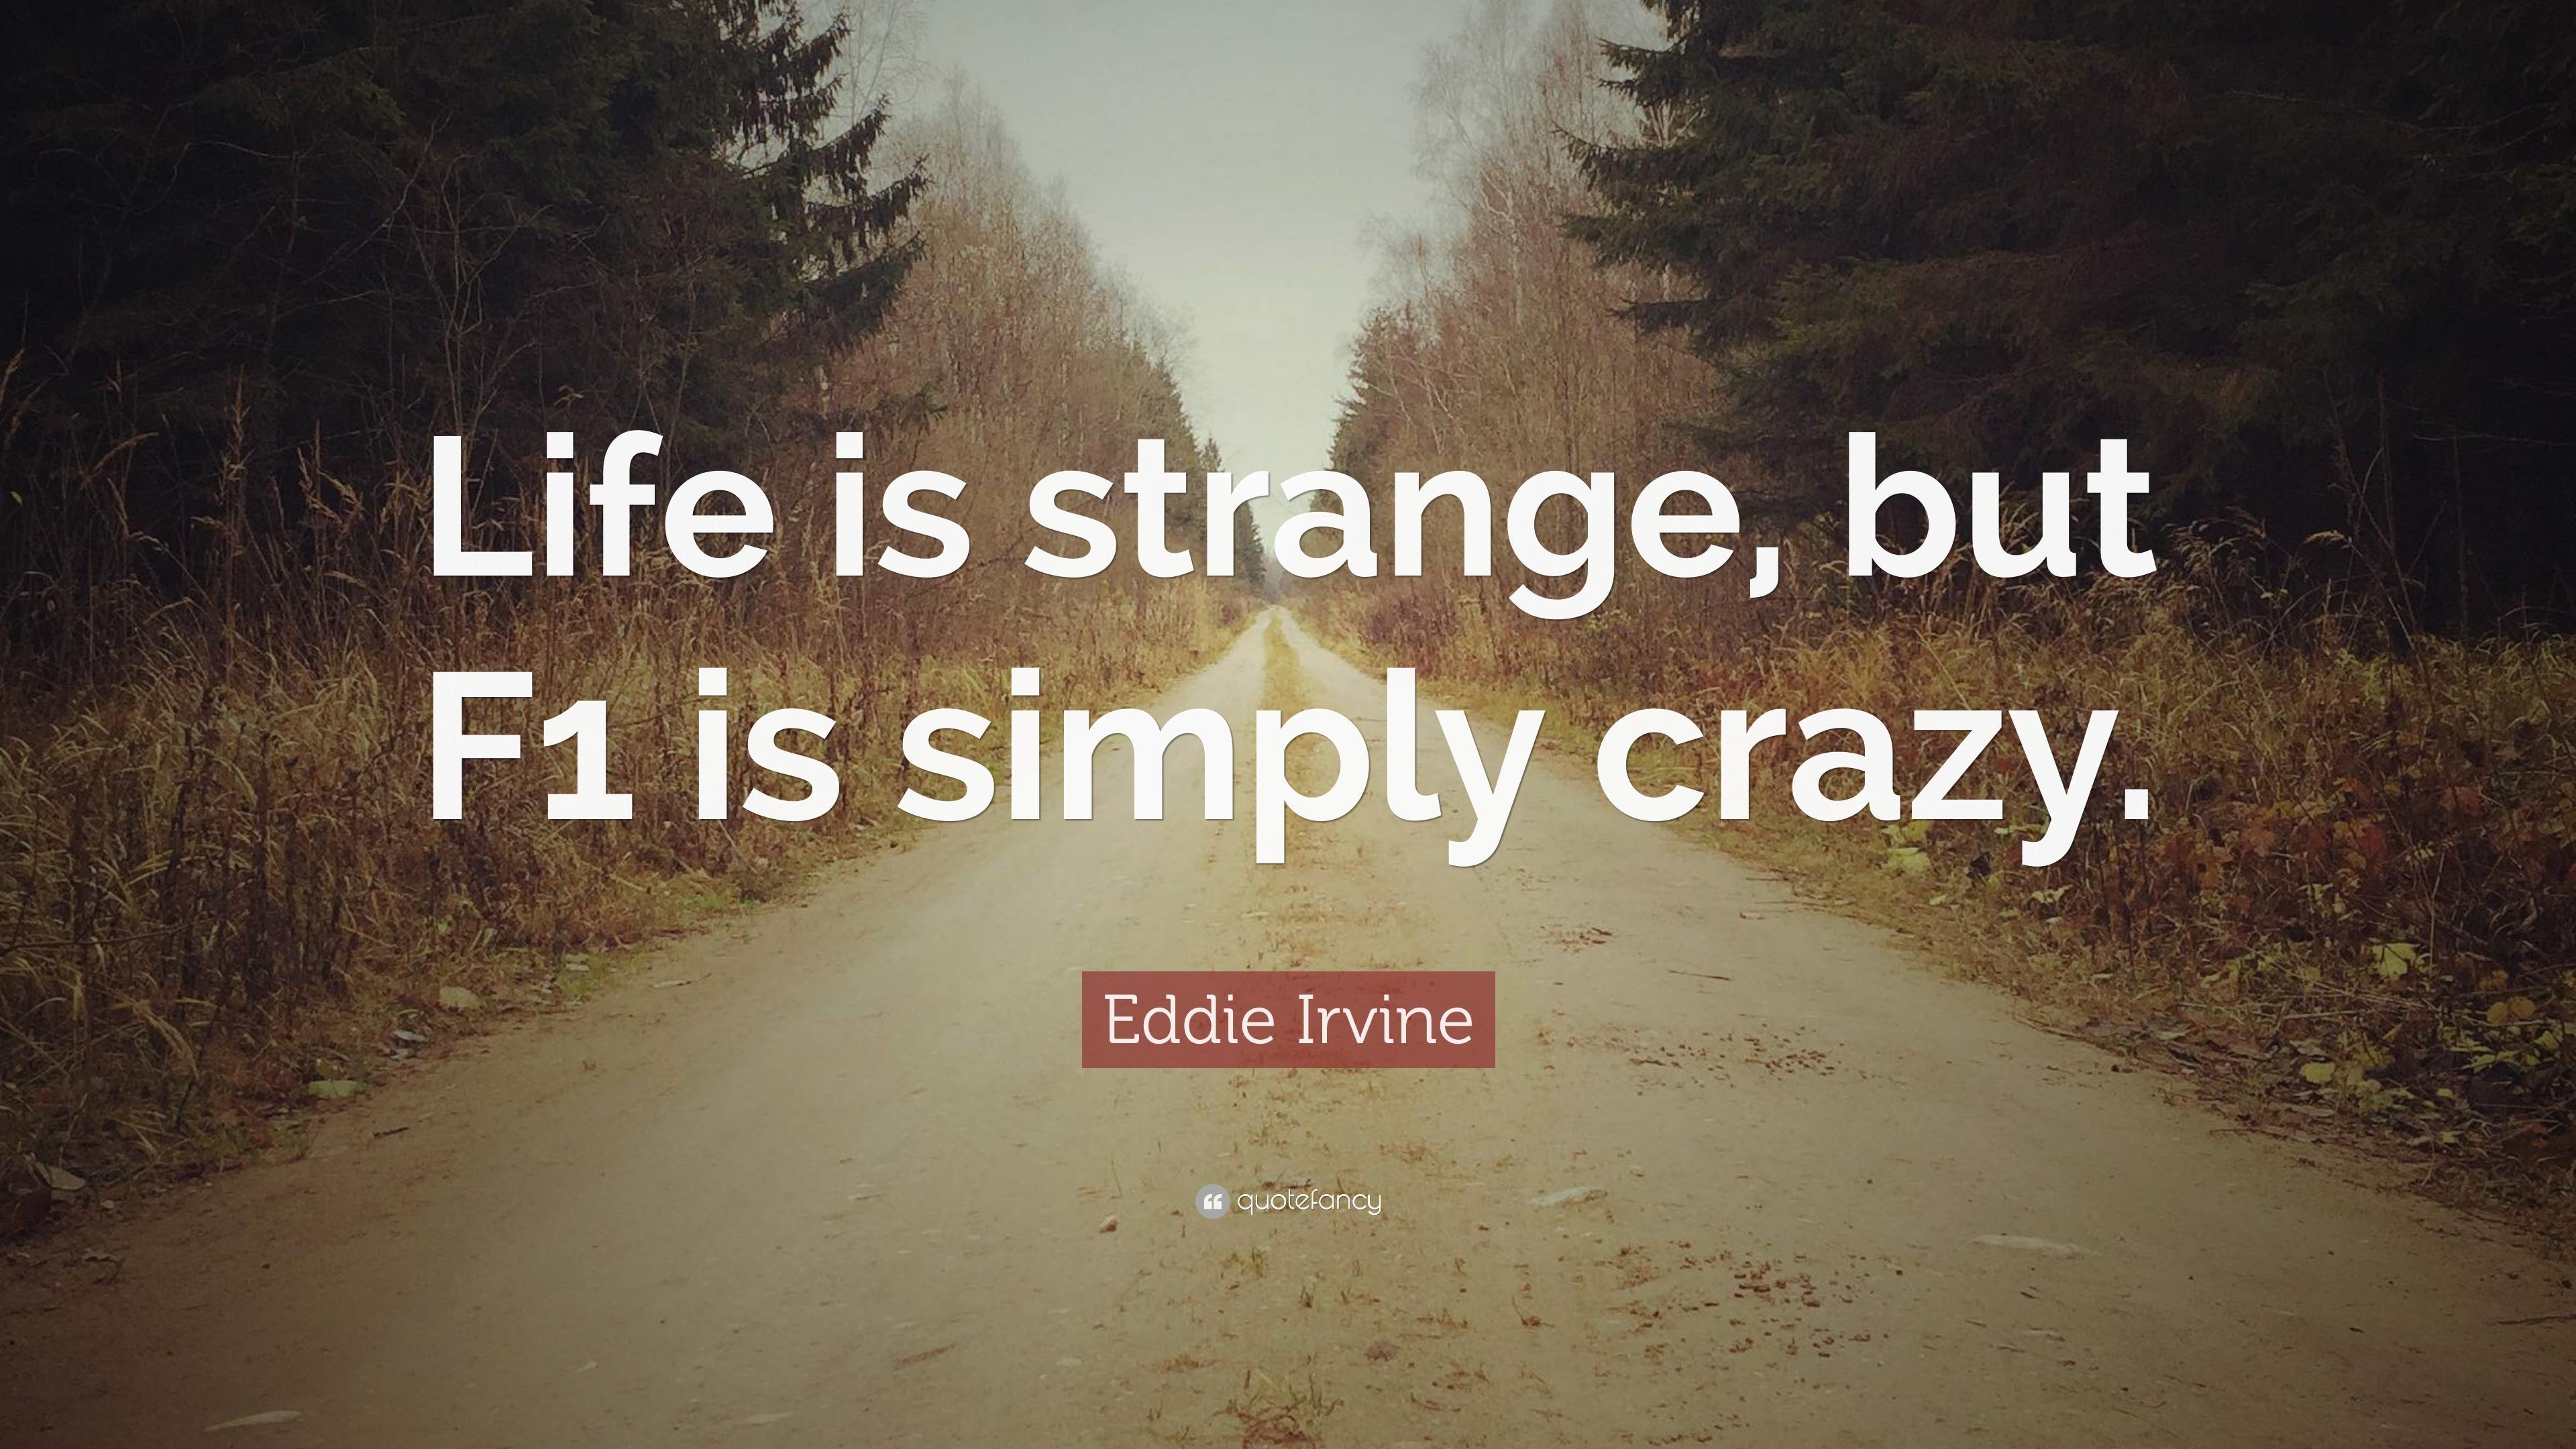 Eddie Irvine Quote Life Is Strange But F1 Is Simply Crazy 10